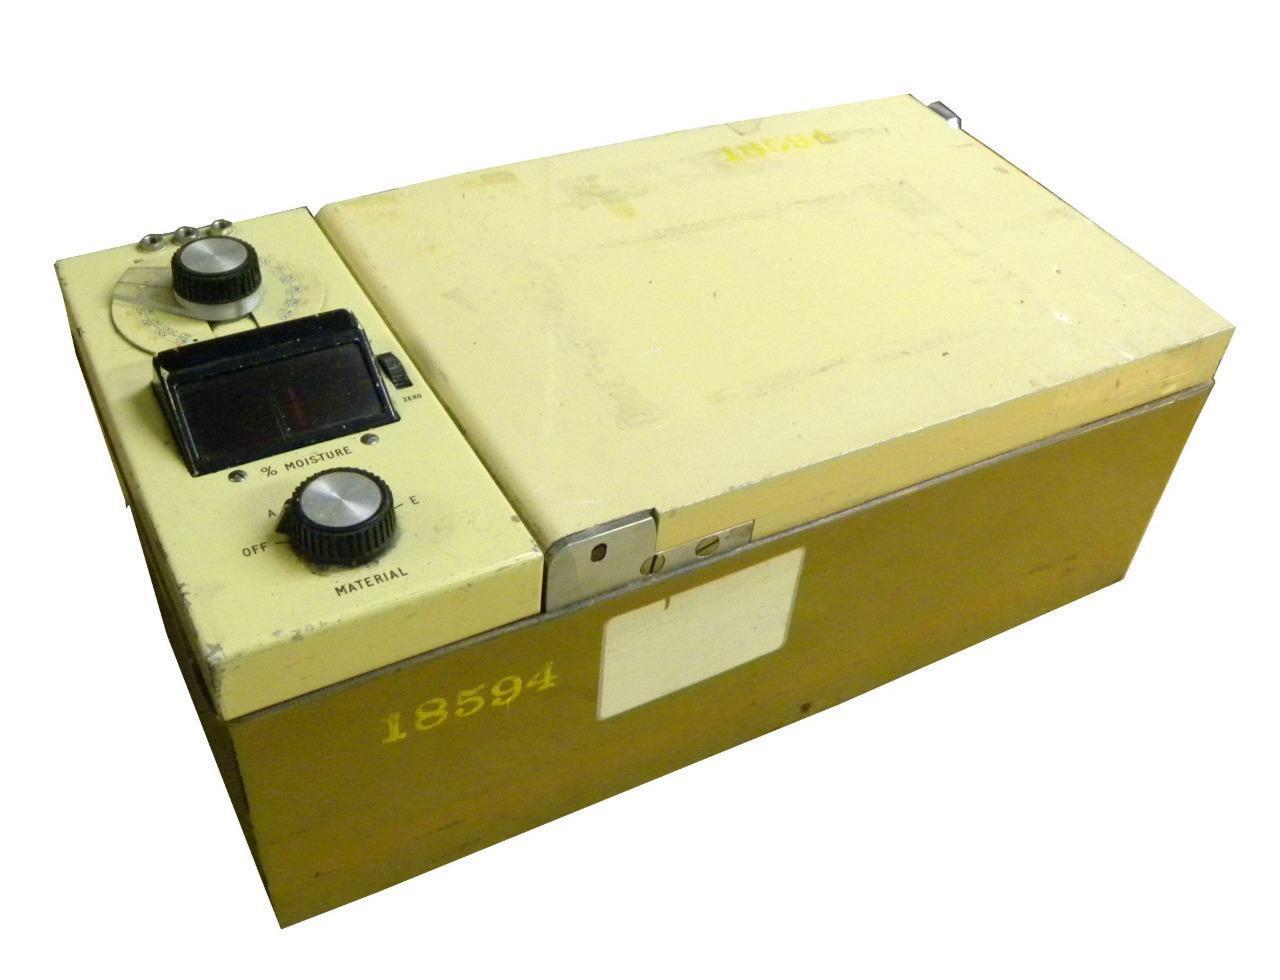 Rango Precisione 200 Igrometro 5 Serie